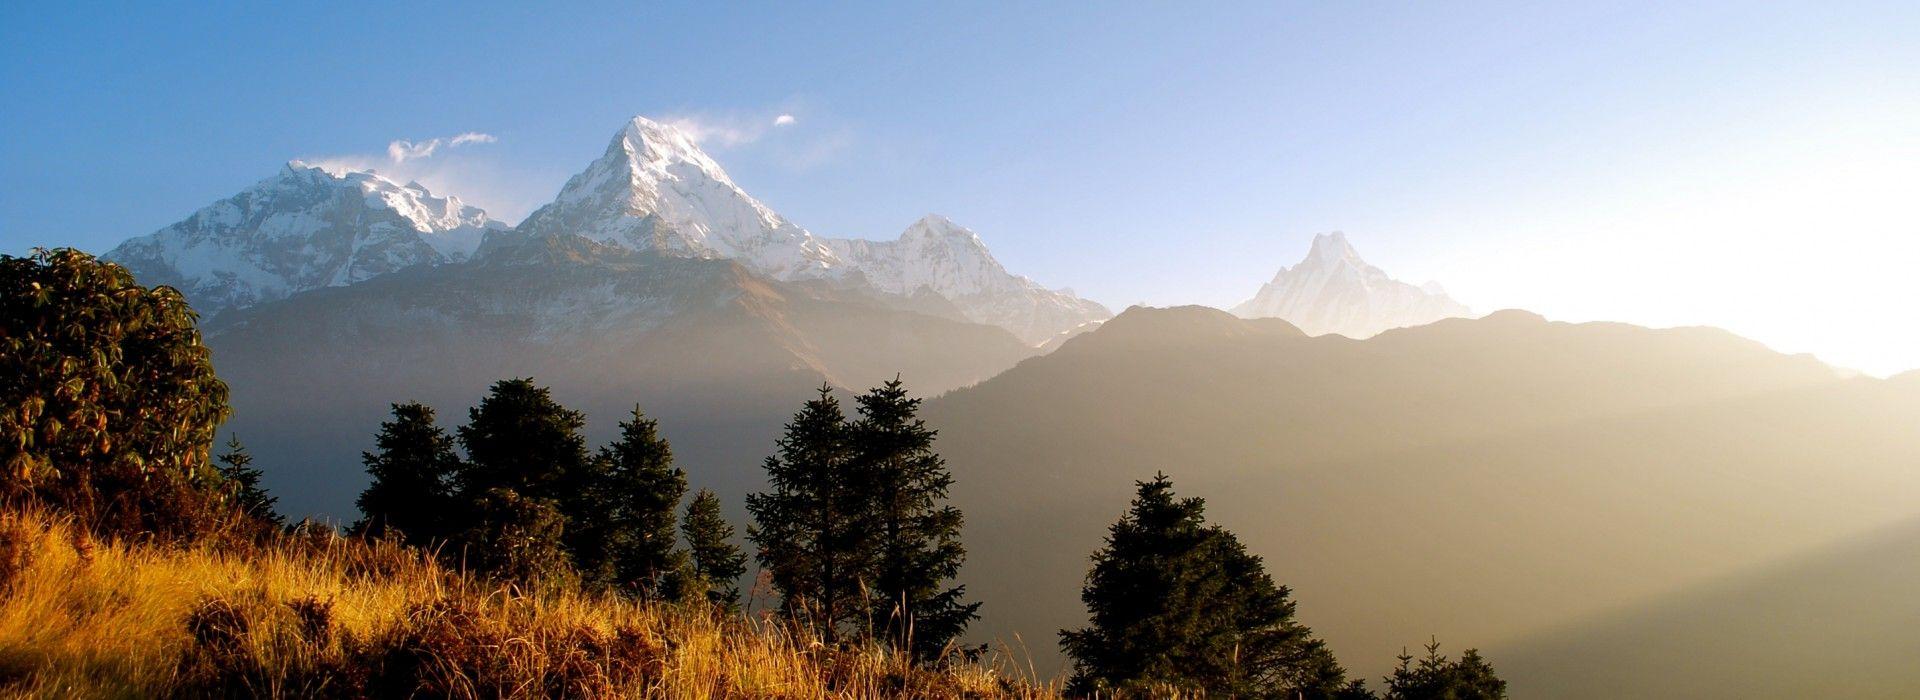 Trekking Tours in Kathmandu